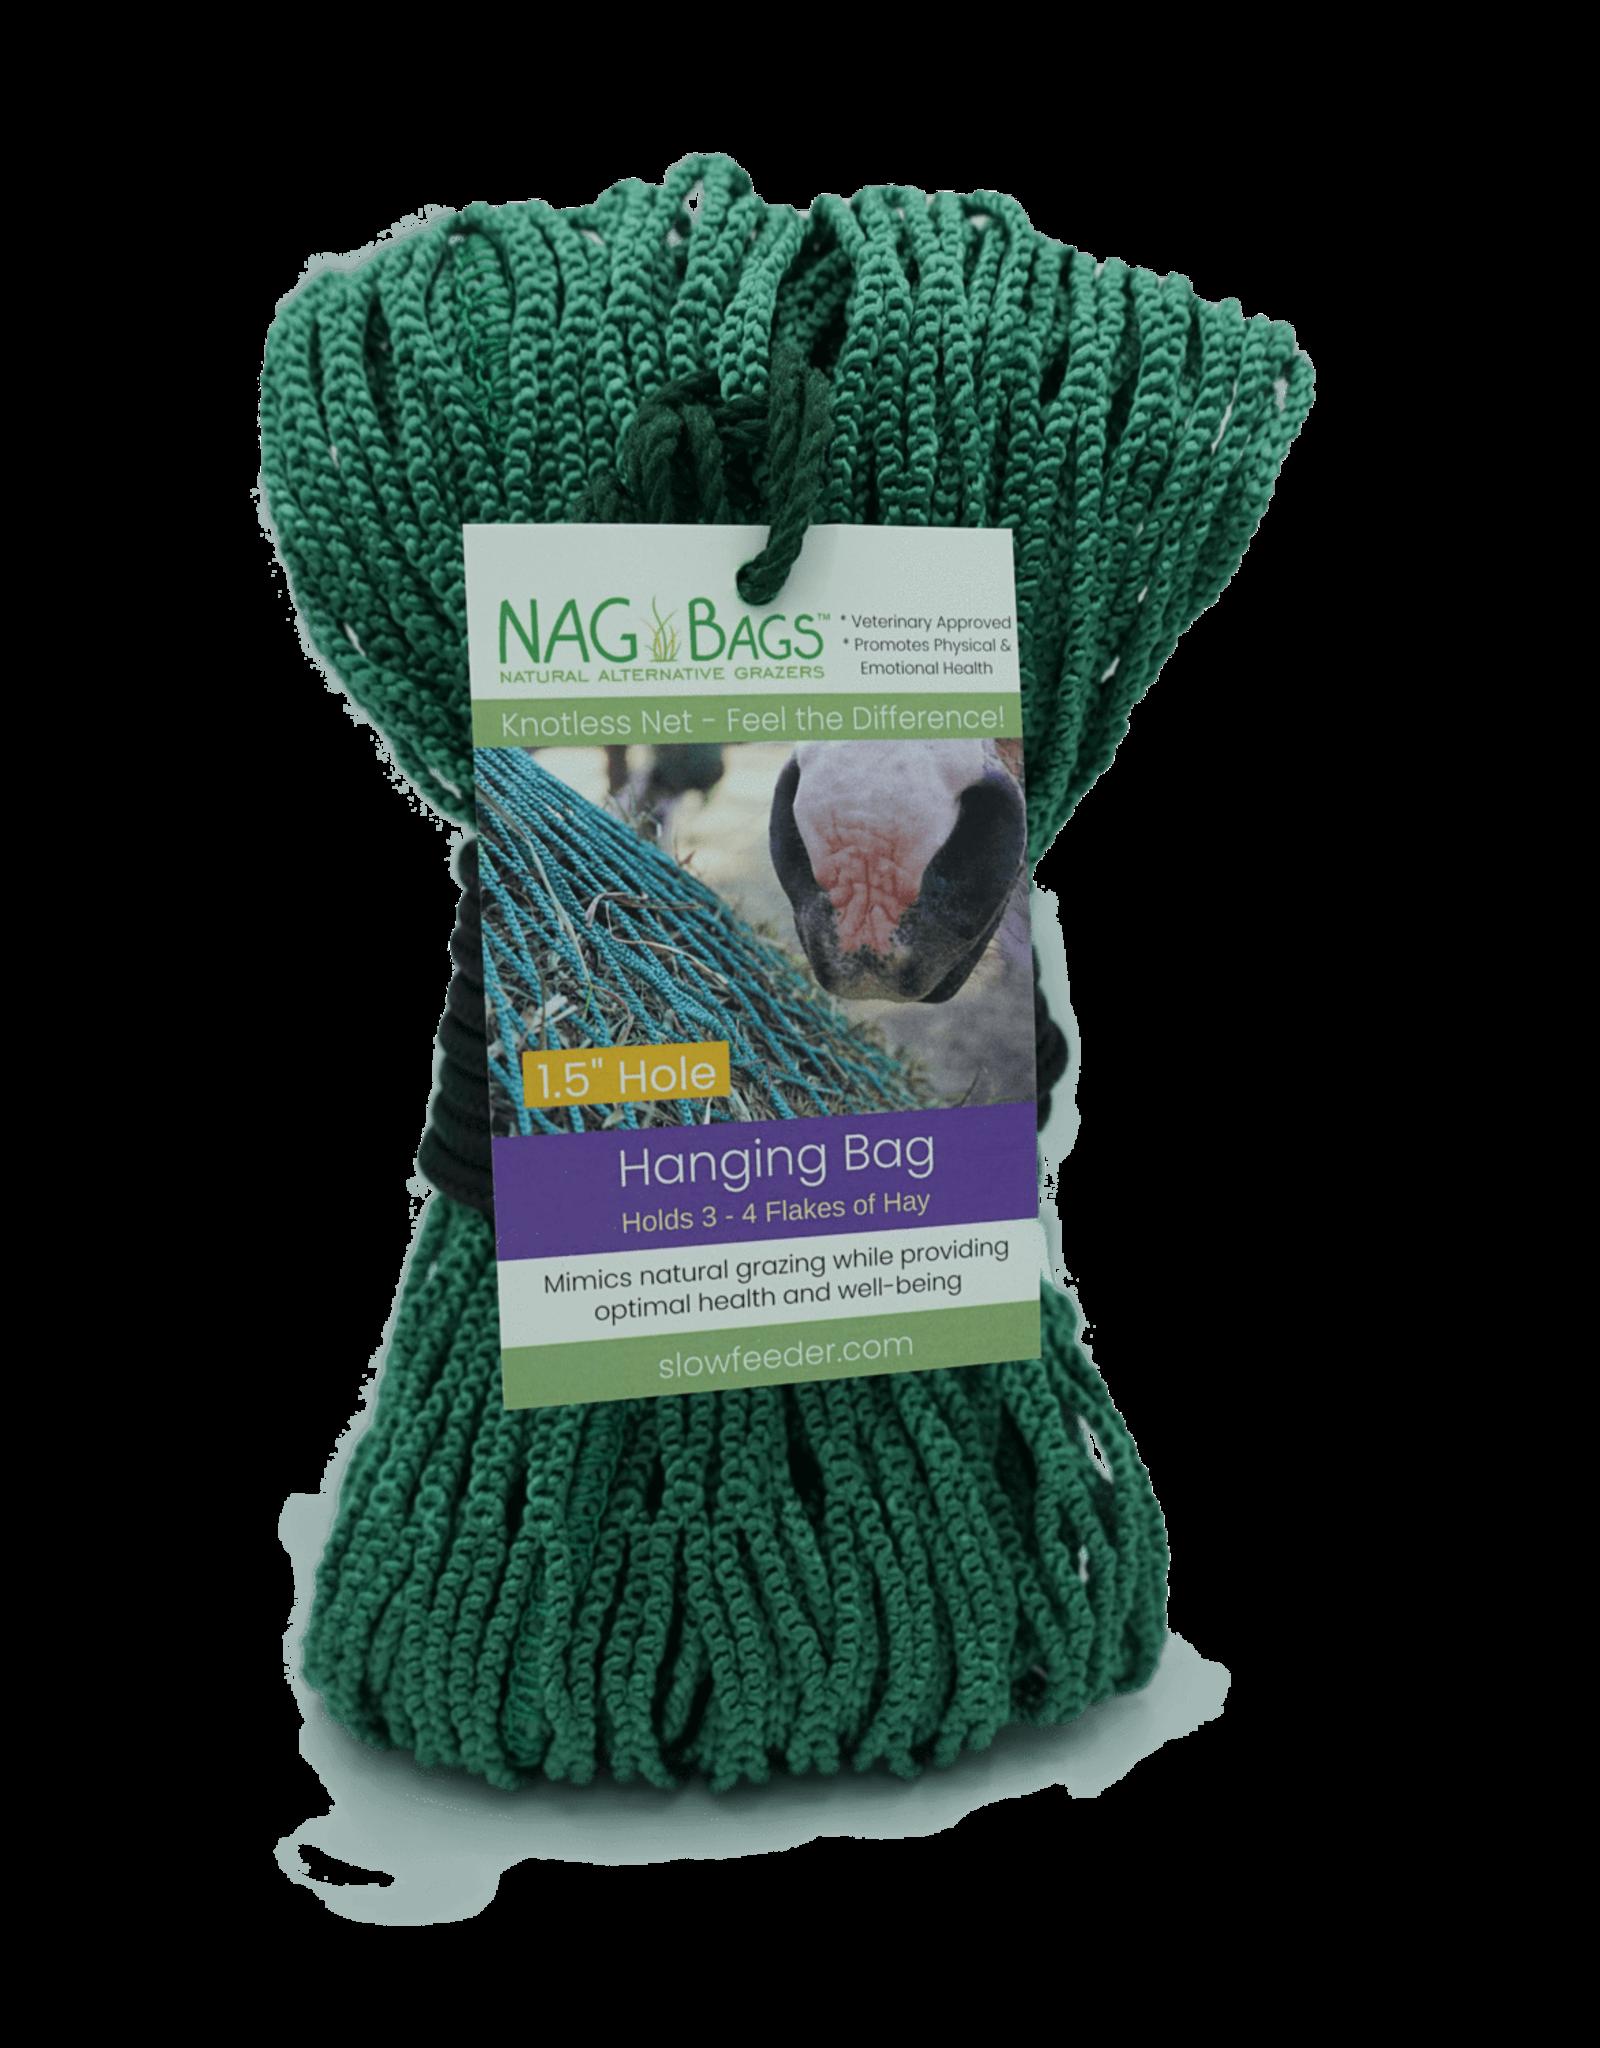 Nag Bag Nag Bag - Day Bag 1.5in 6-8 flakes